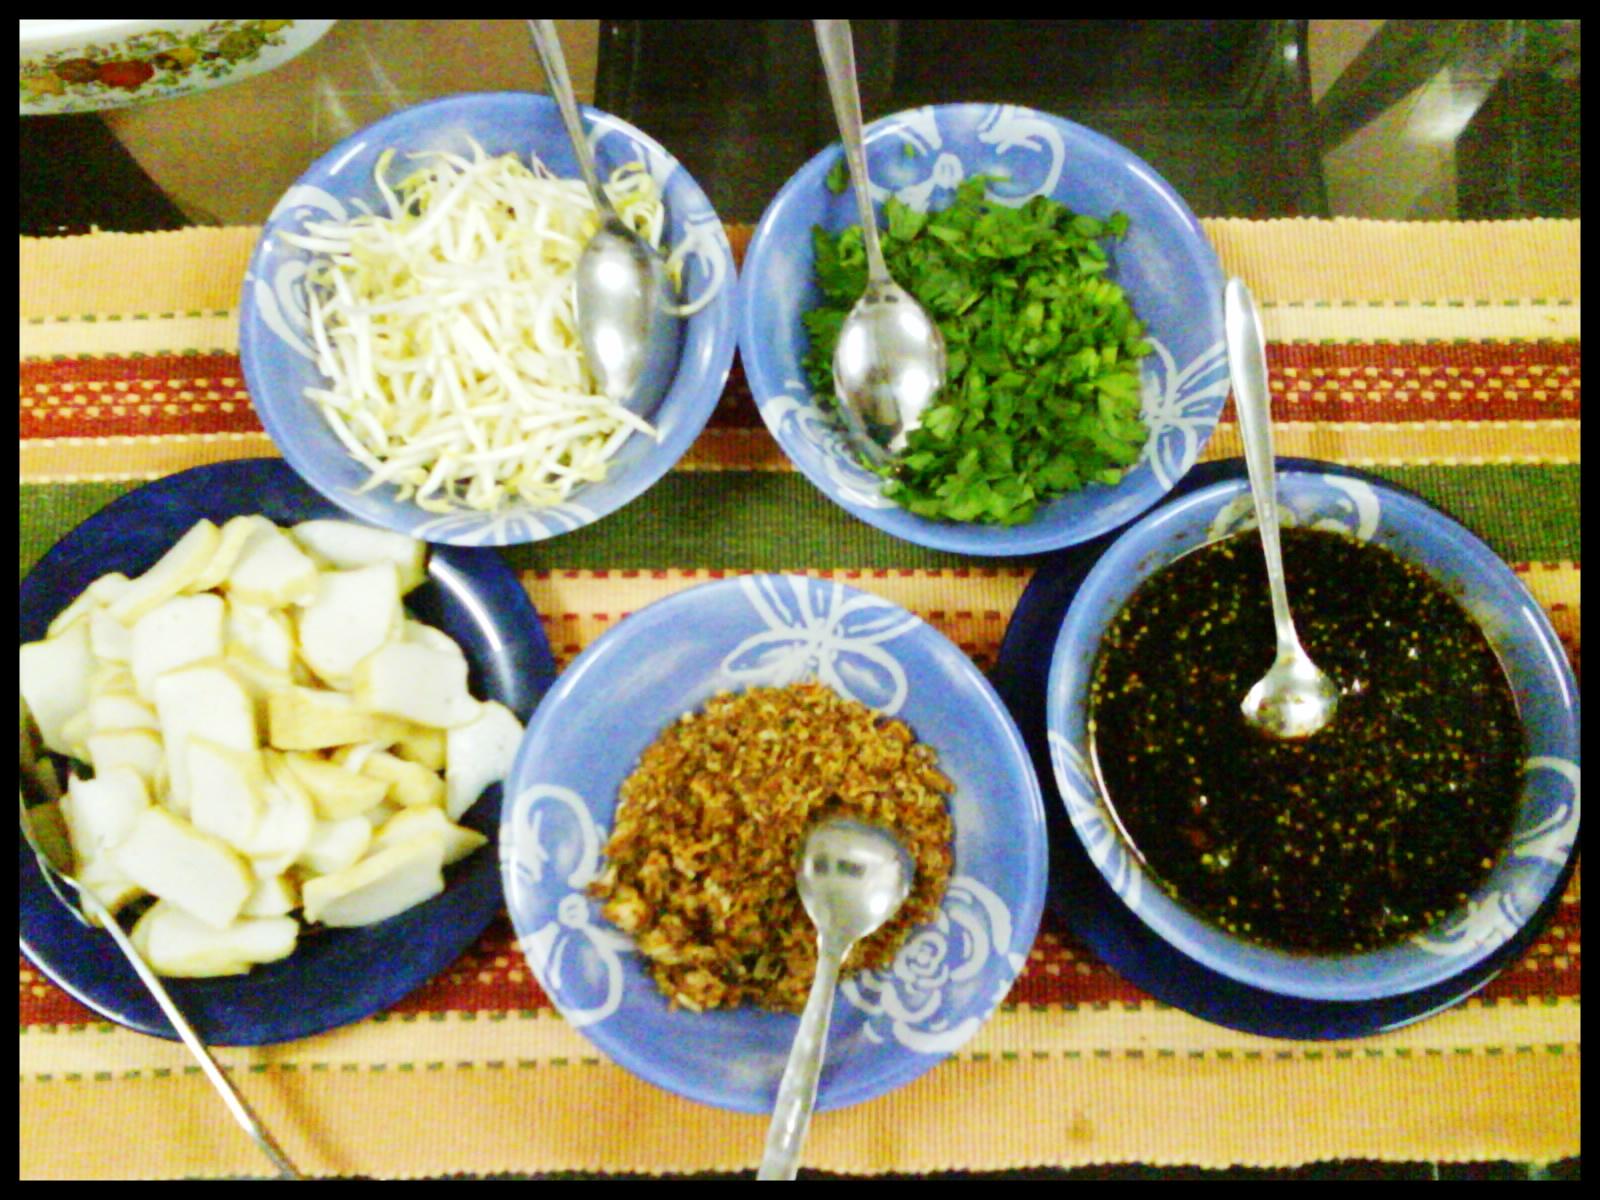 ayam resepi soto ayam johor asli Resepi Laksa Mee Goreng Enak dan Mudah